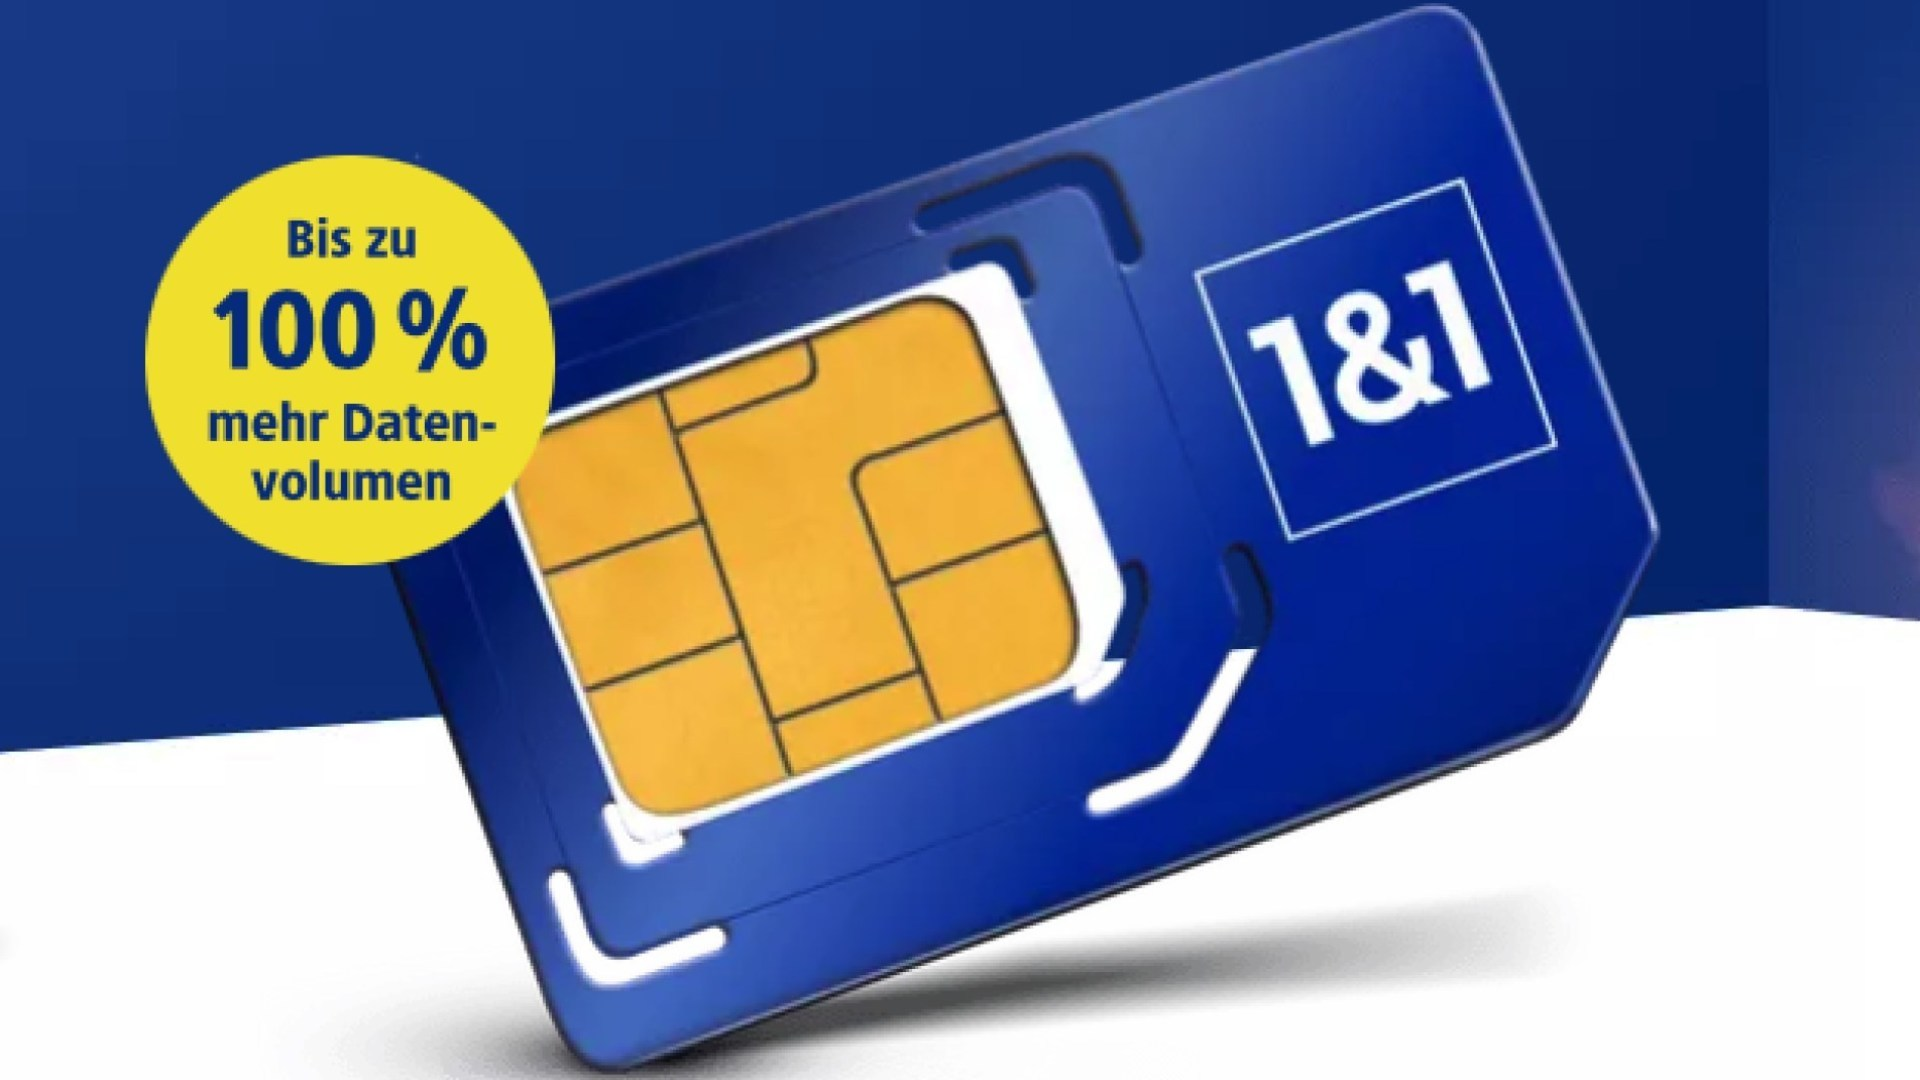 Smartphone, Mobilfunk, Daten, Tarif, 1&1, Service Card